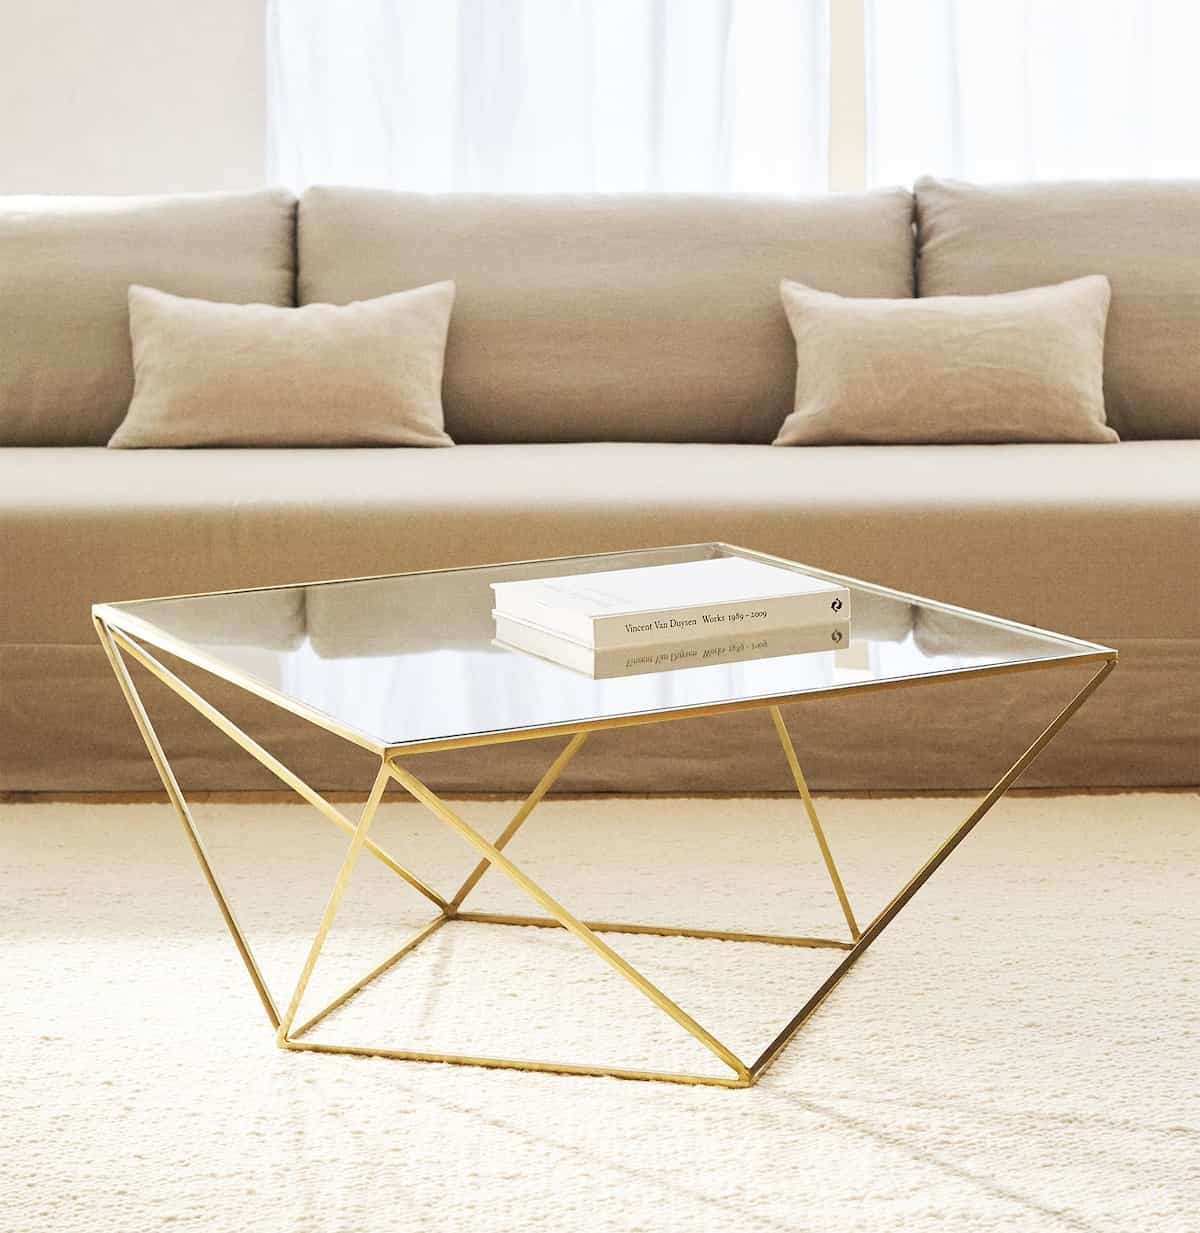 imprescindibles en el salon una mesa geometrica